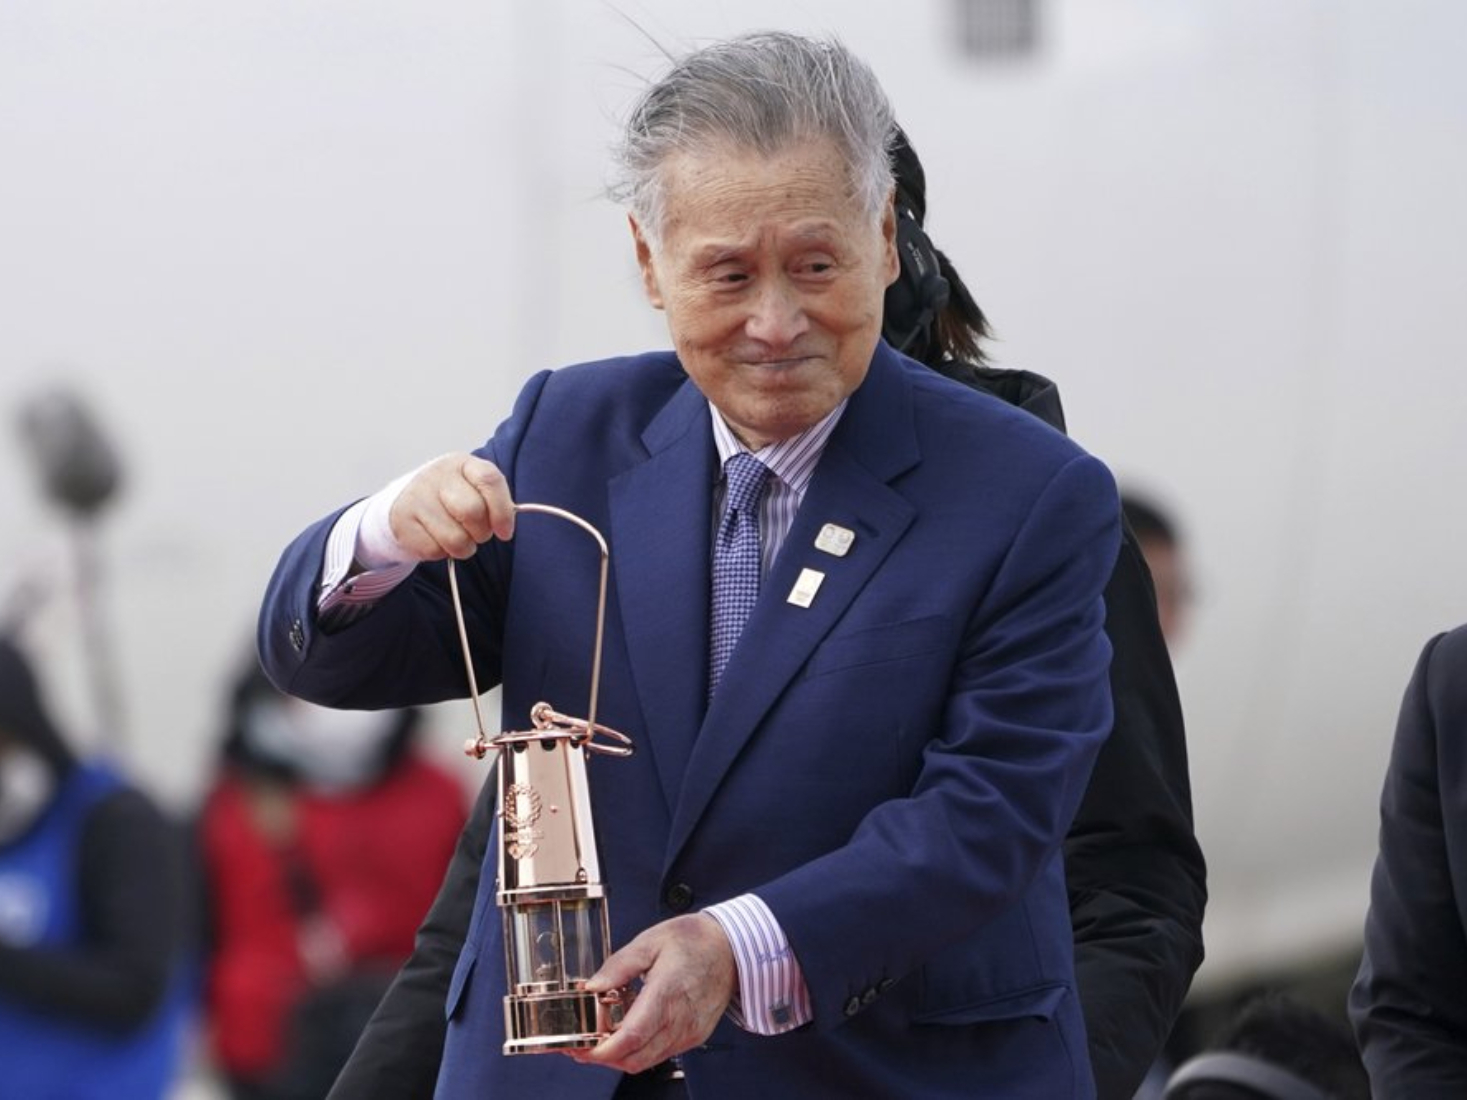 Tokyo 2020 organizers to select Mori's successor 'soon'